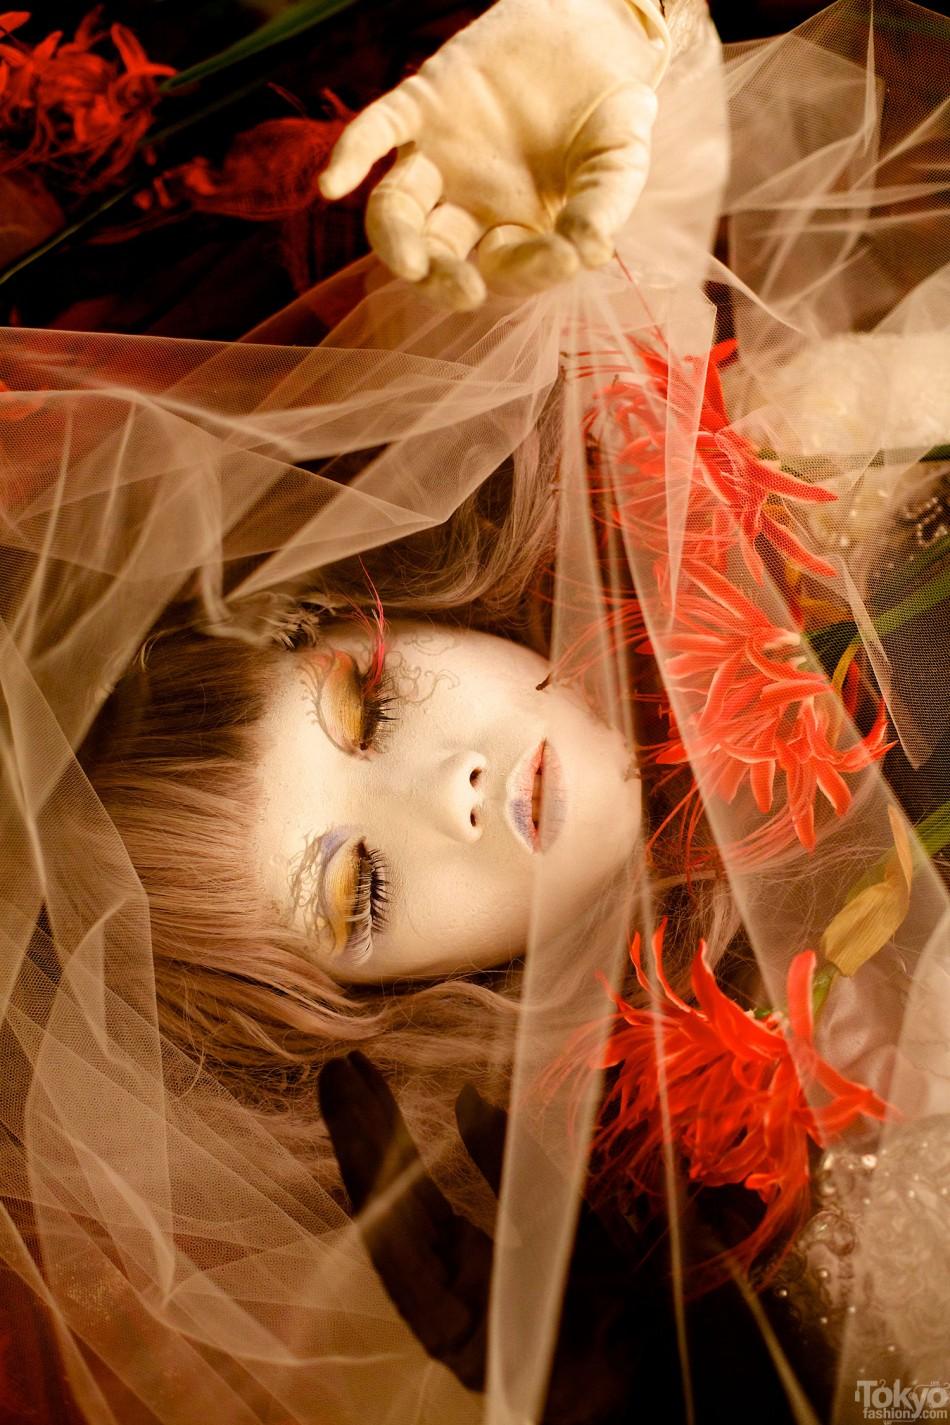 Minori - Her Memories of a Dream (13)